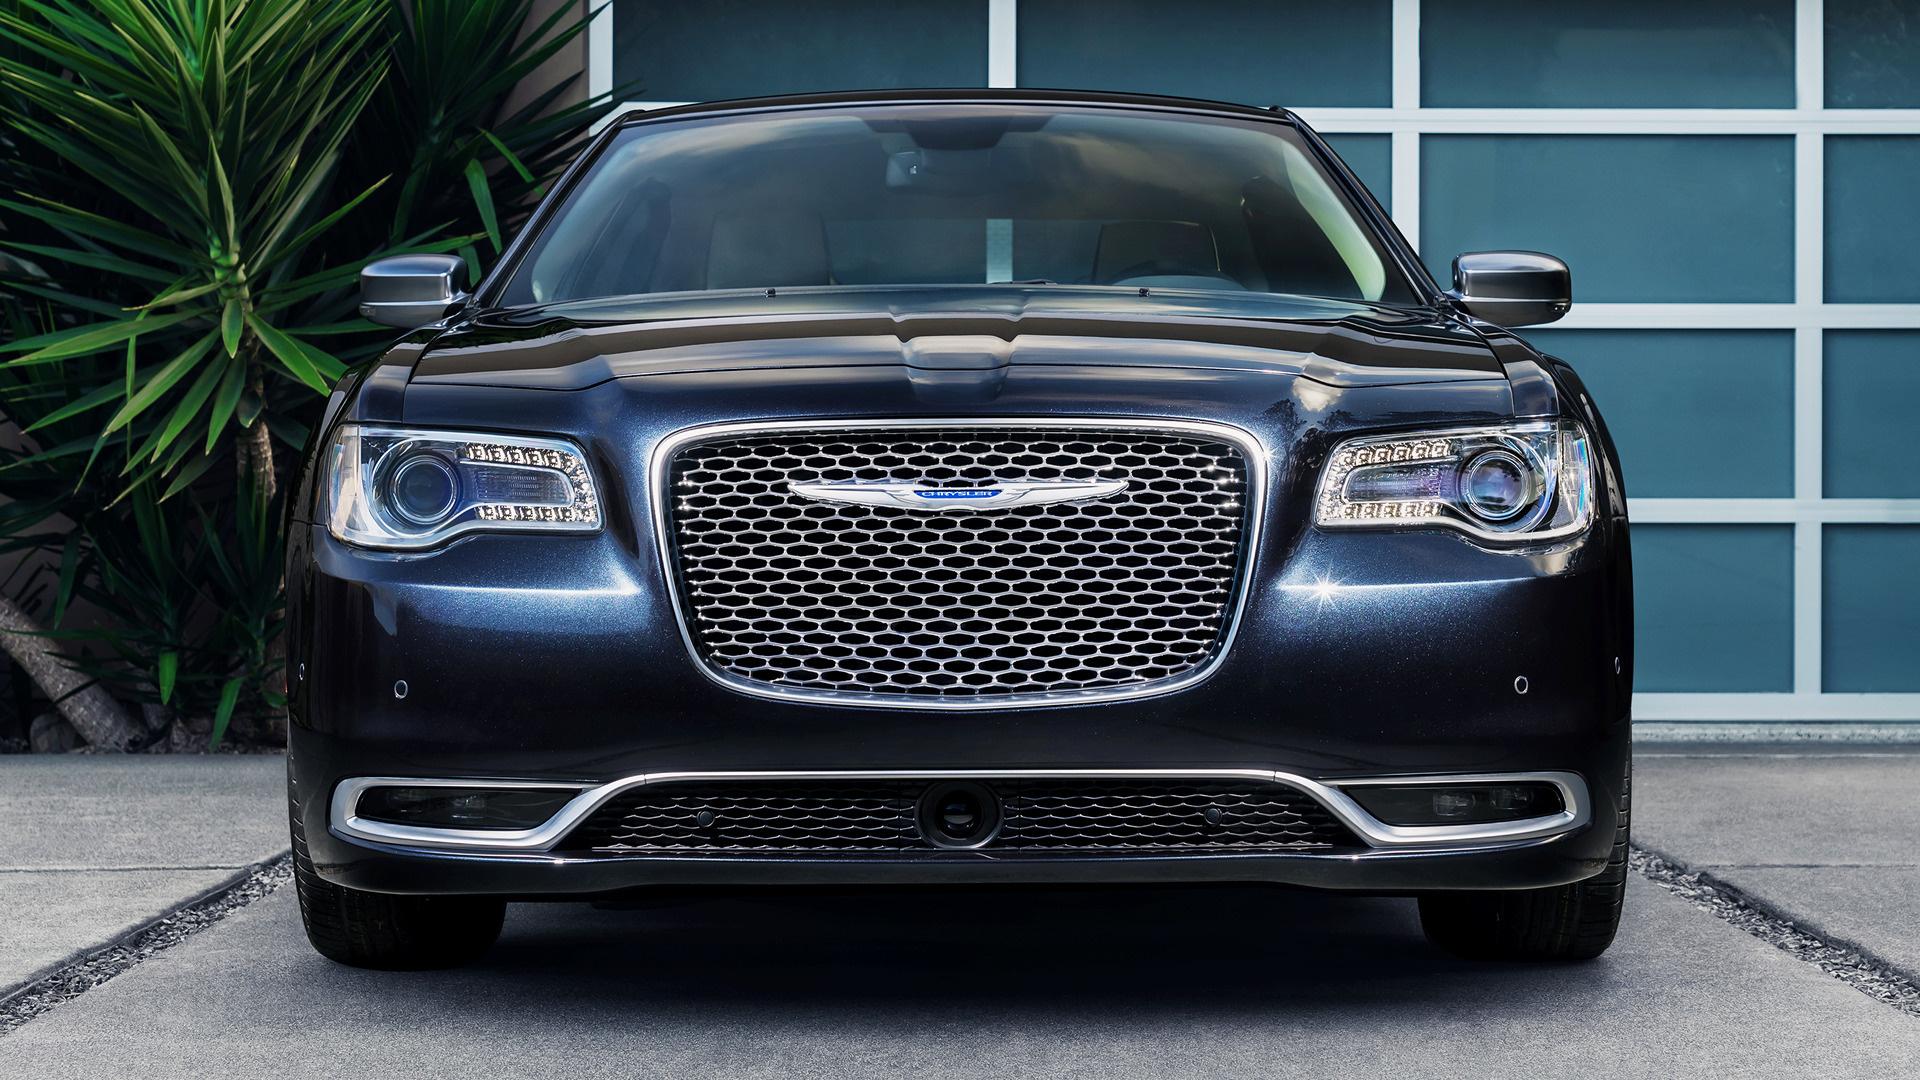 2015 Chrysler 300C Platinum - Wallpapers and HD Images | Car Pixel